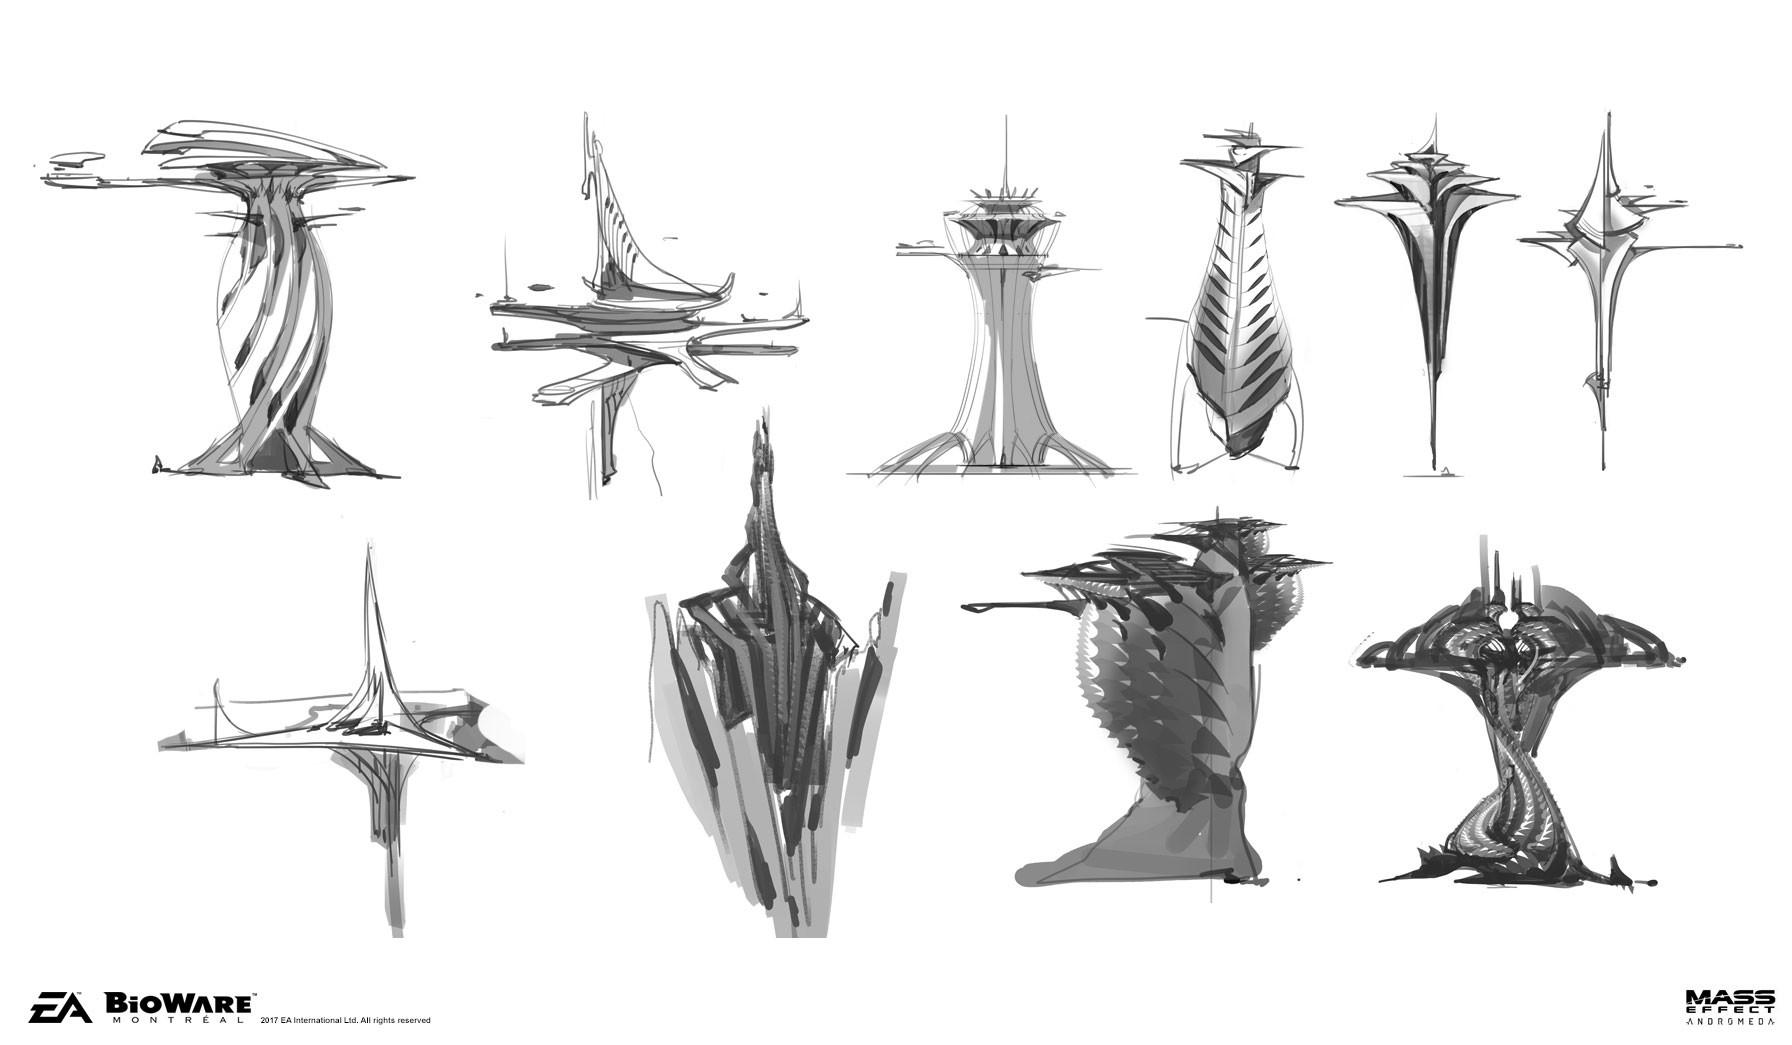 Mass-Effect-Andromeda-Concept-Art-ben-lo-early-kett04-env.jpeg (1792×1045)